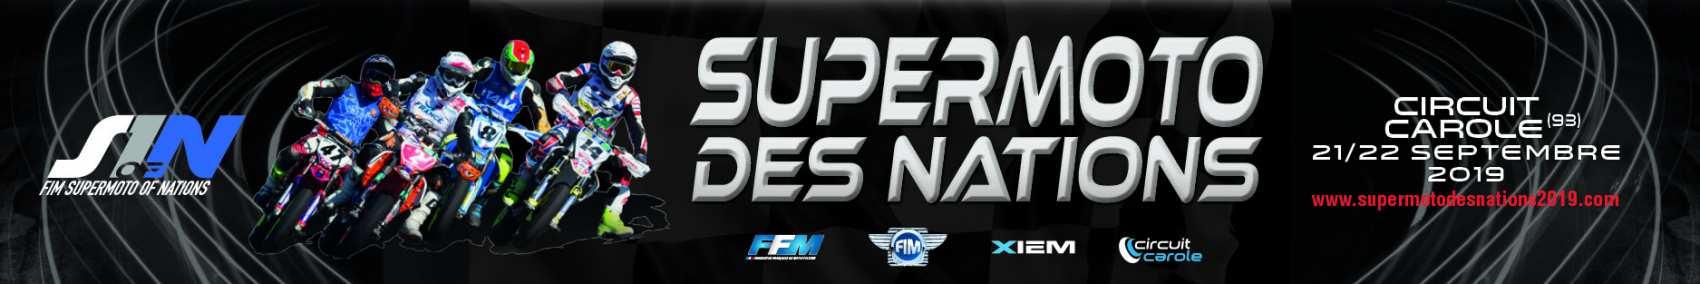 Supermoto des Nations 2019 - Mobile